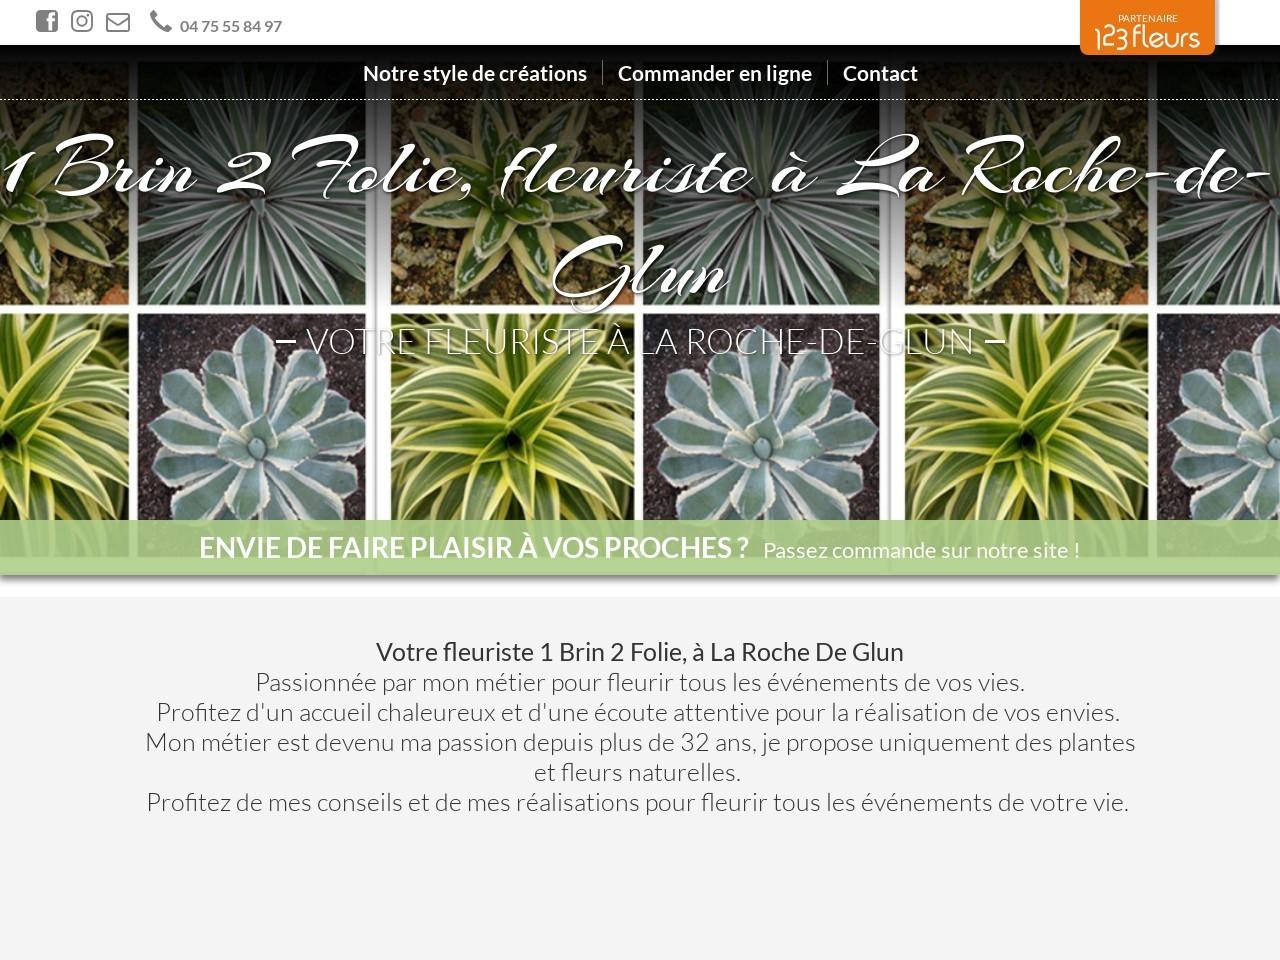 Site fleuriste 1brin2folie - 123fleurs